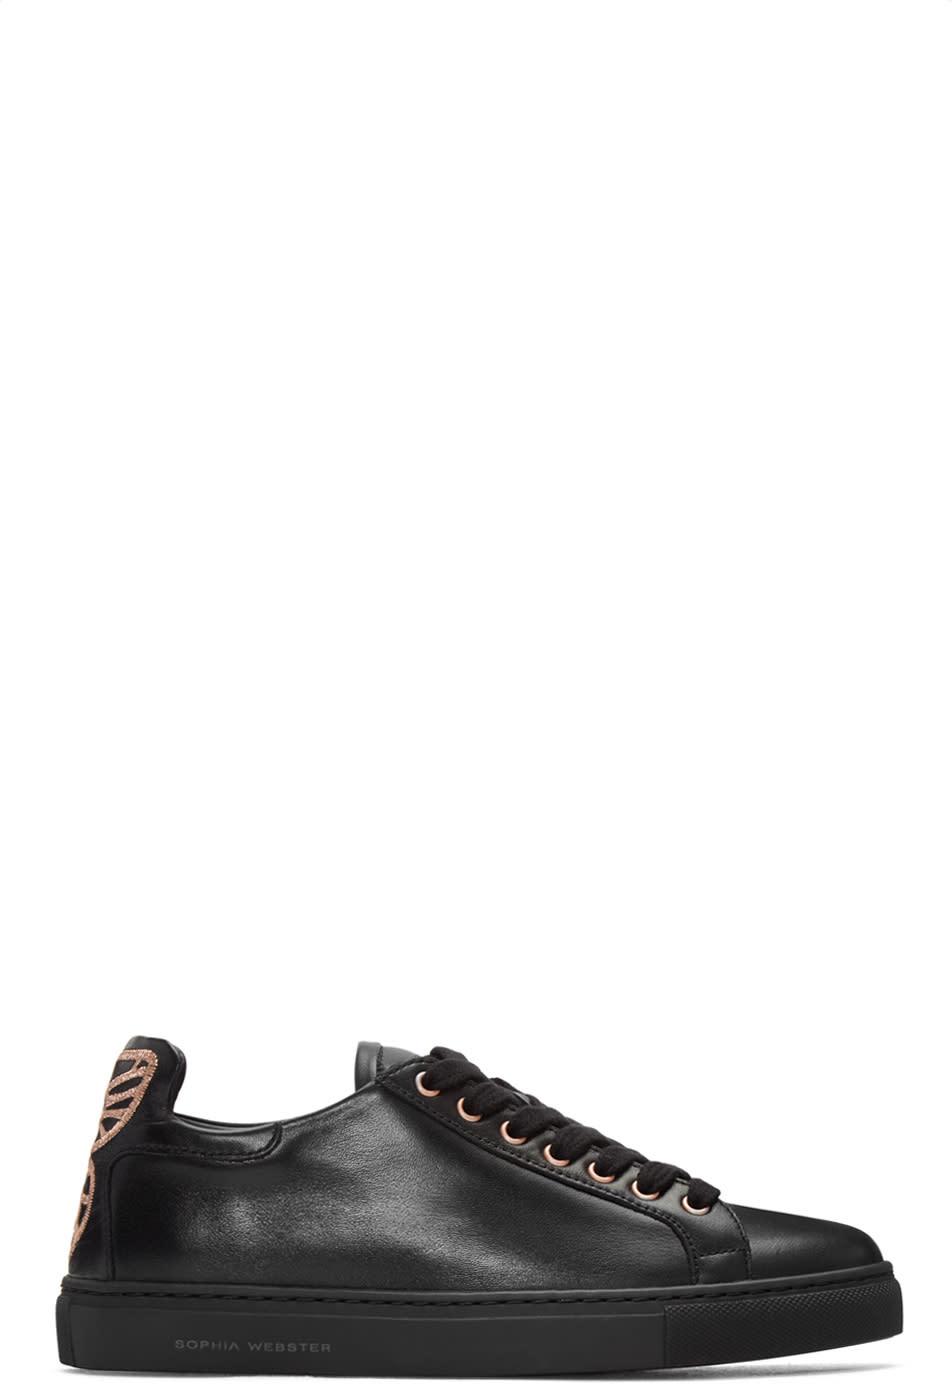 Sophia Webster Black Leather Bibi Sneakers